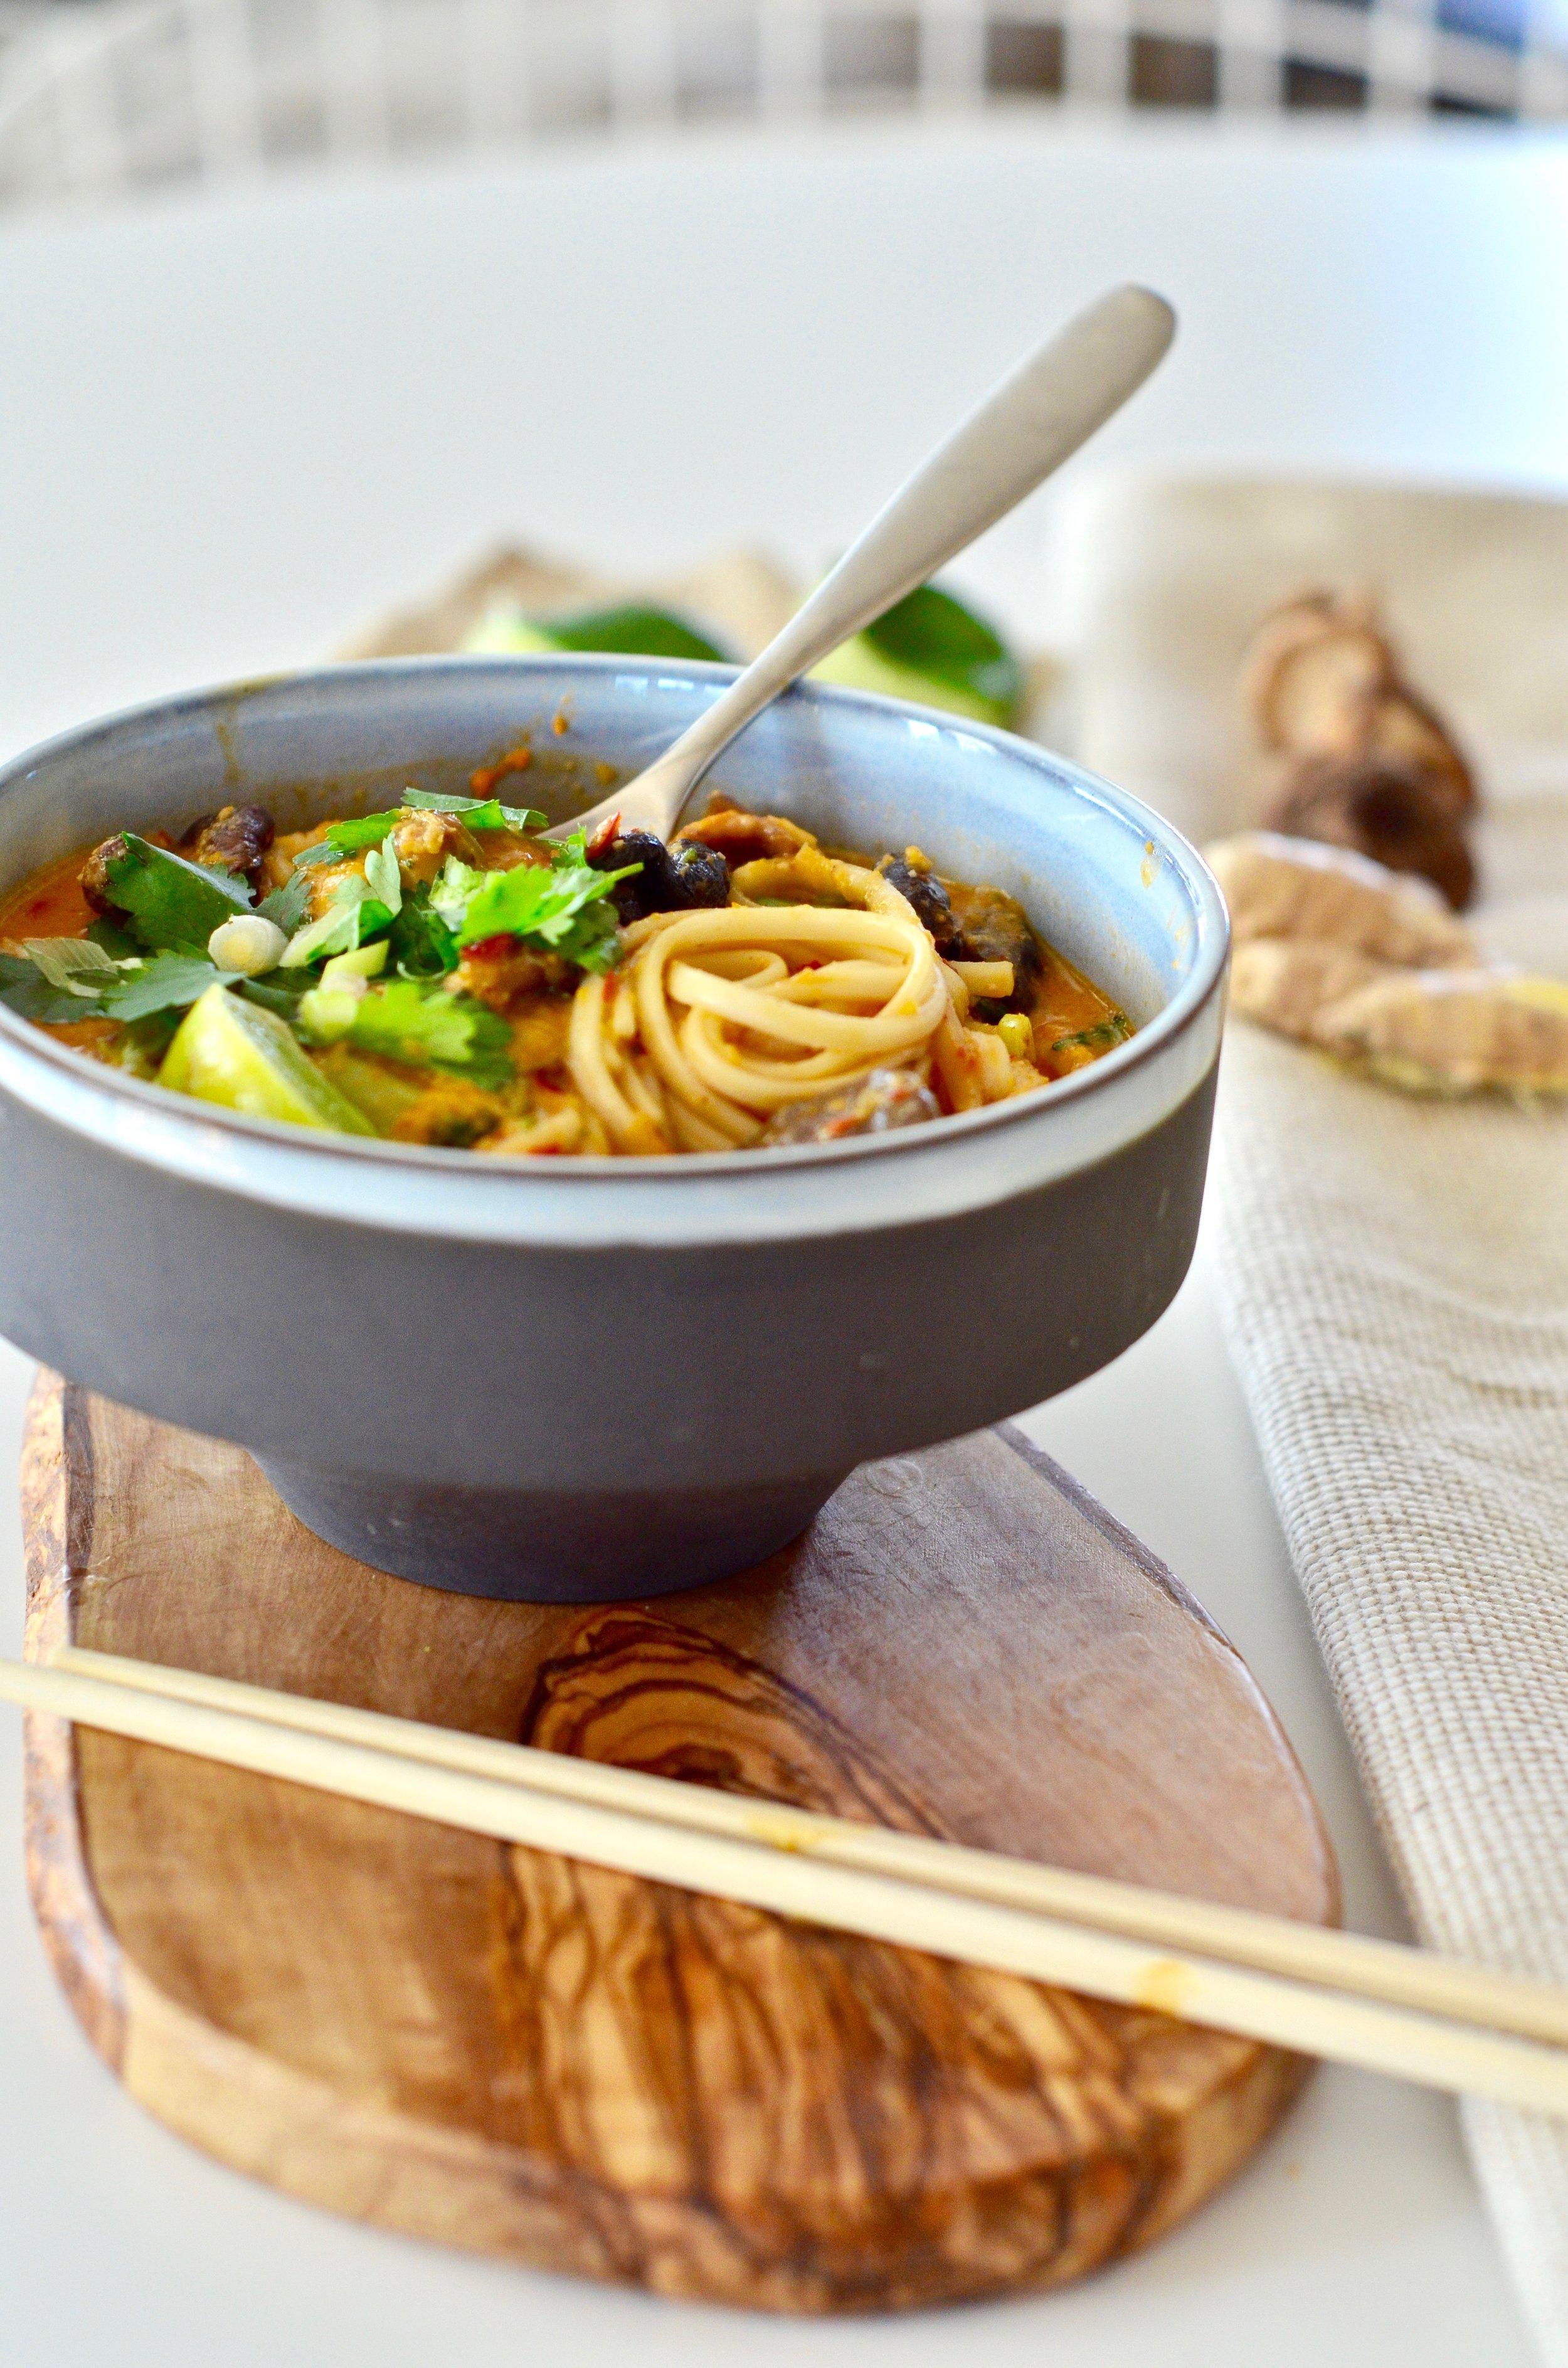 Laksa Soup Recipe with noodles. Vegan + gluten-free. @PureMamas